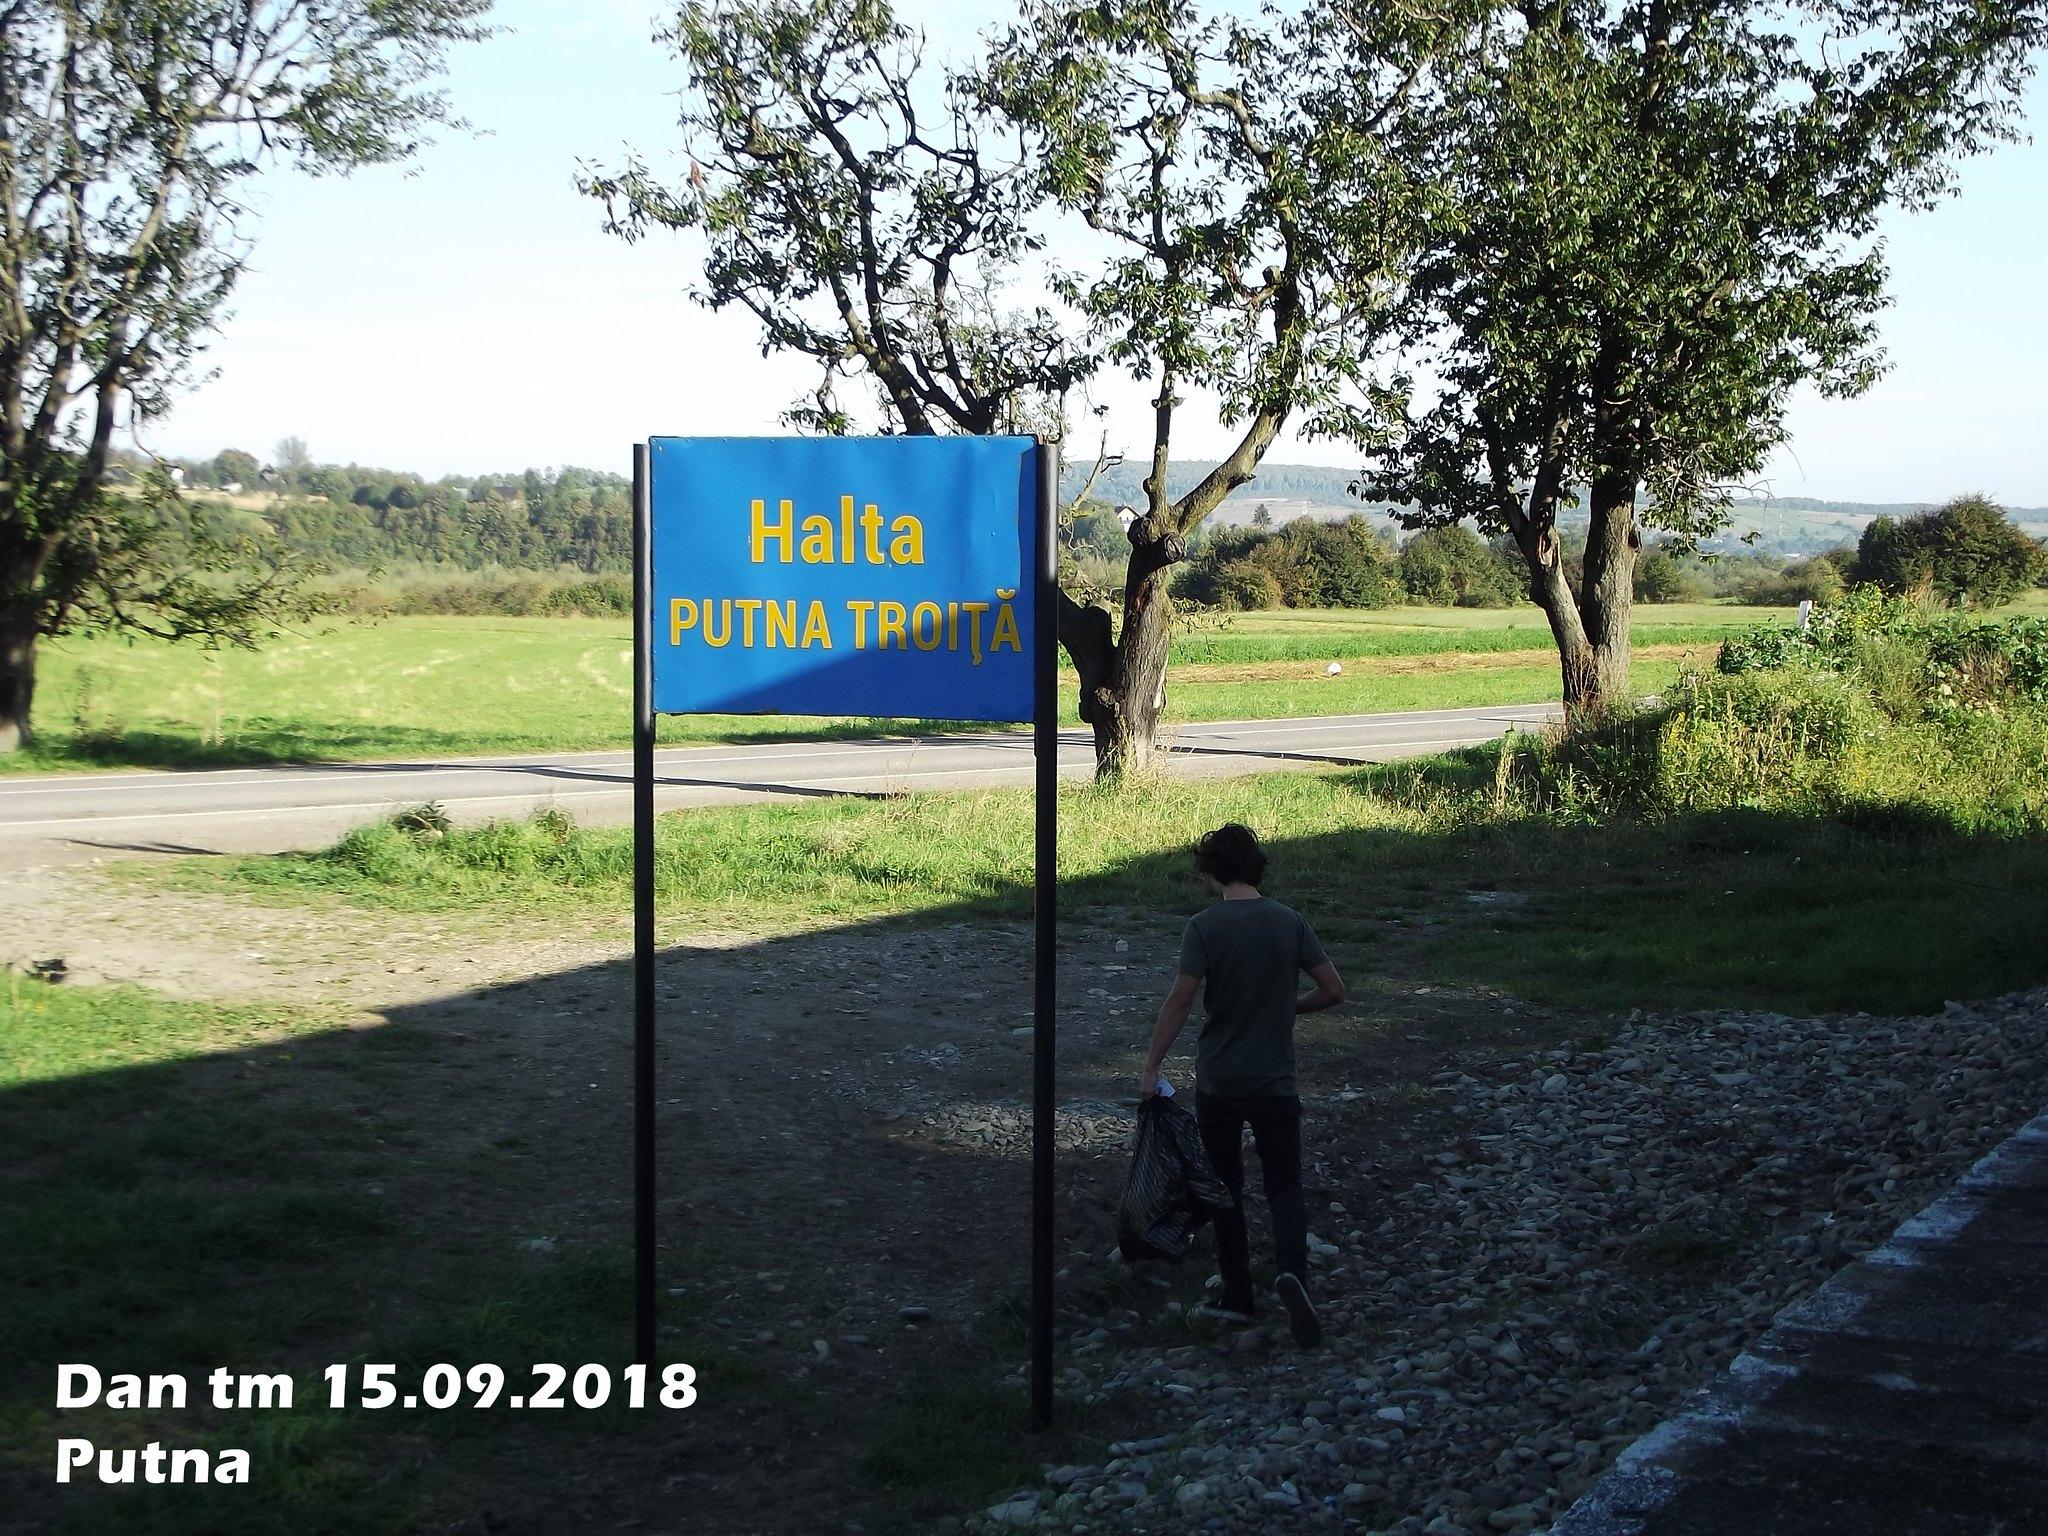 515 : Dorneşti - Gura Putnei - (Putna) - Nisipitu - Seletin UKR - Pagina 47 43826157655_f6ddec7af0_k